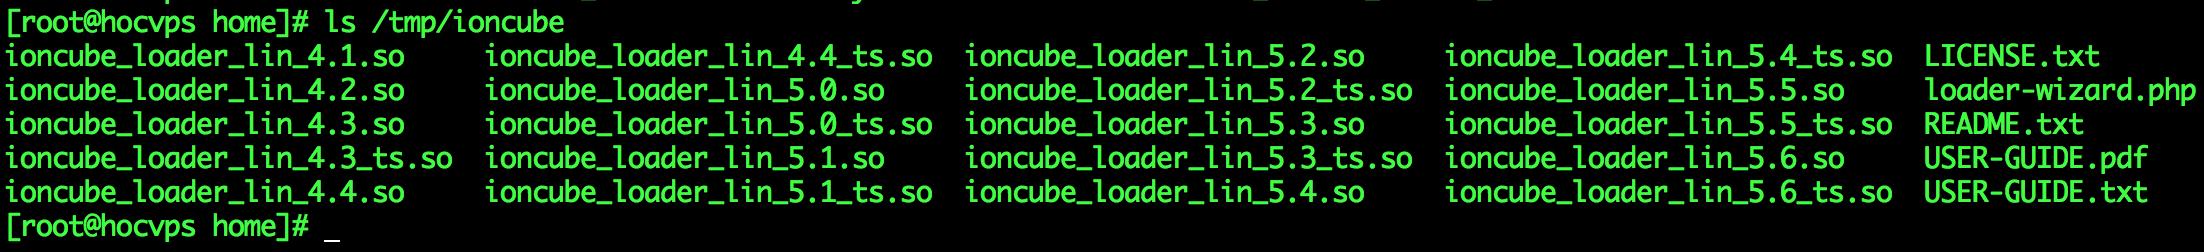 Cac phien ban ionCube Loader